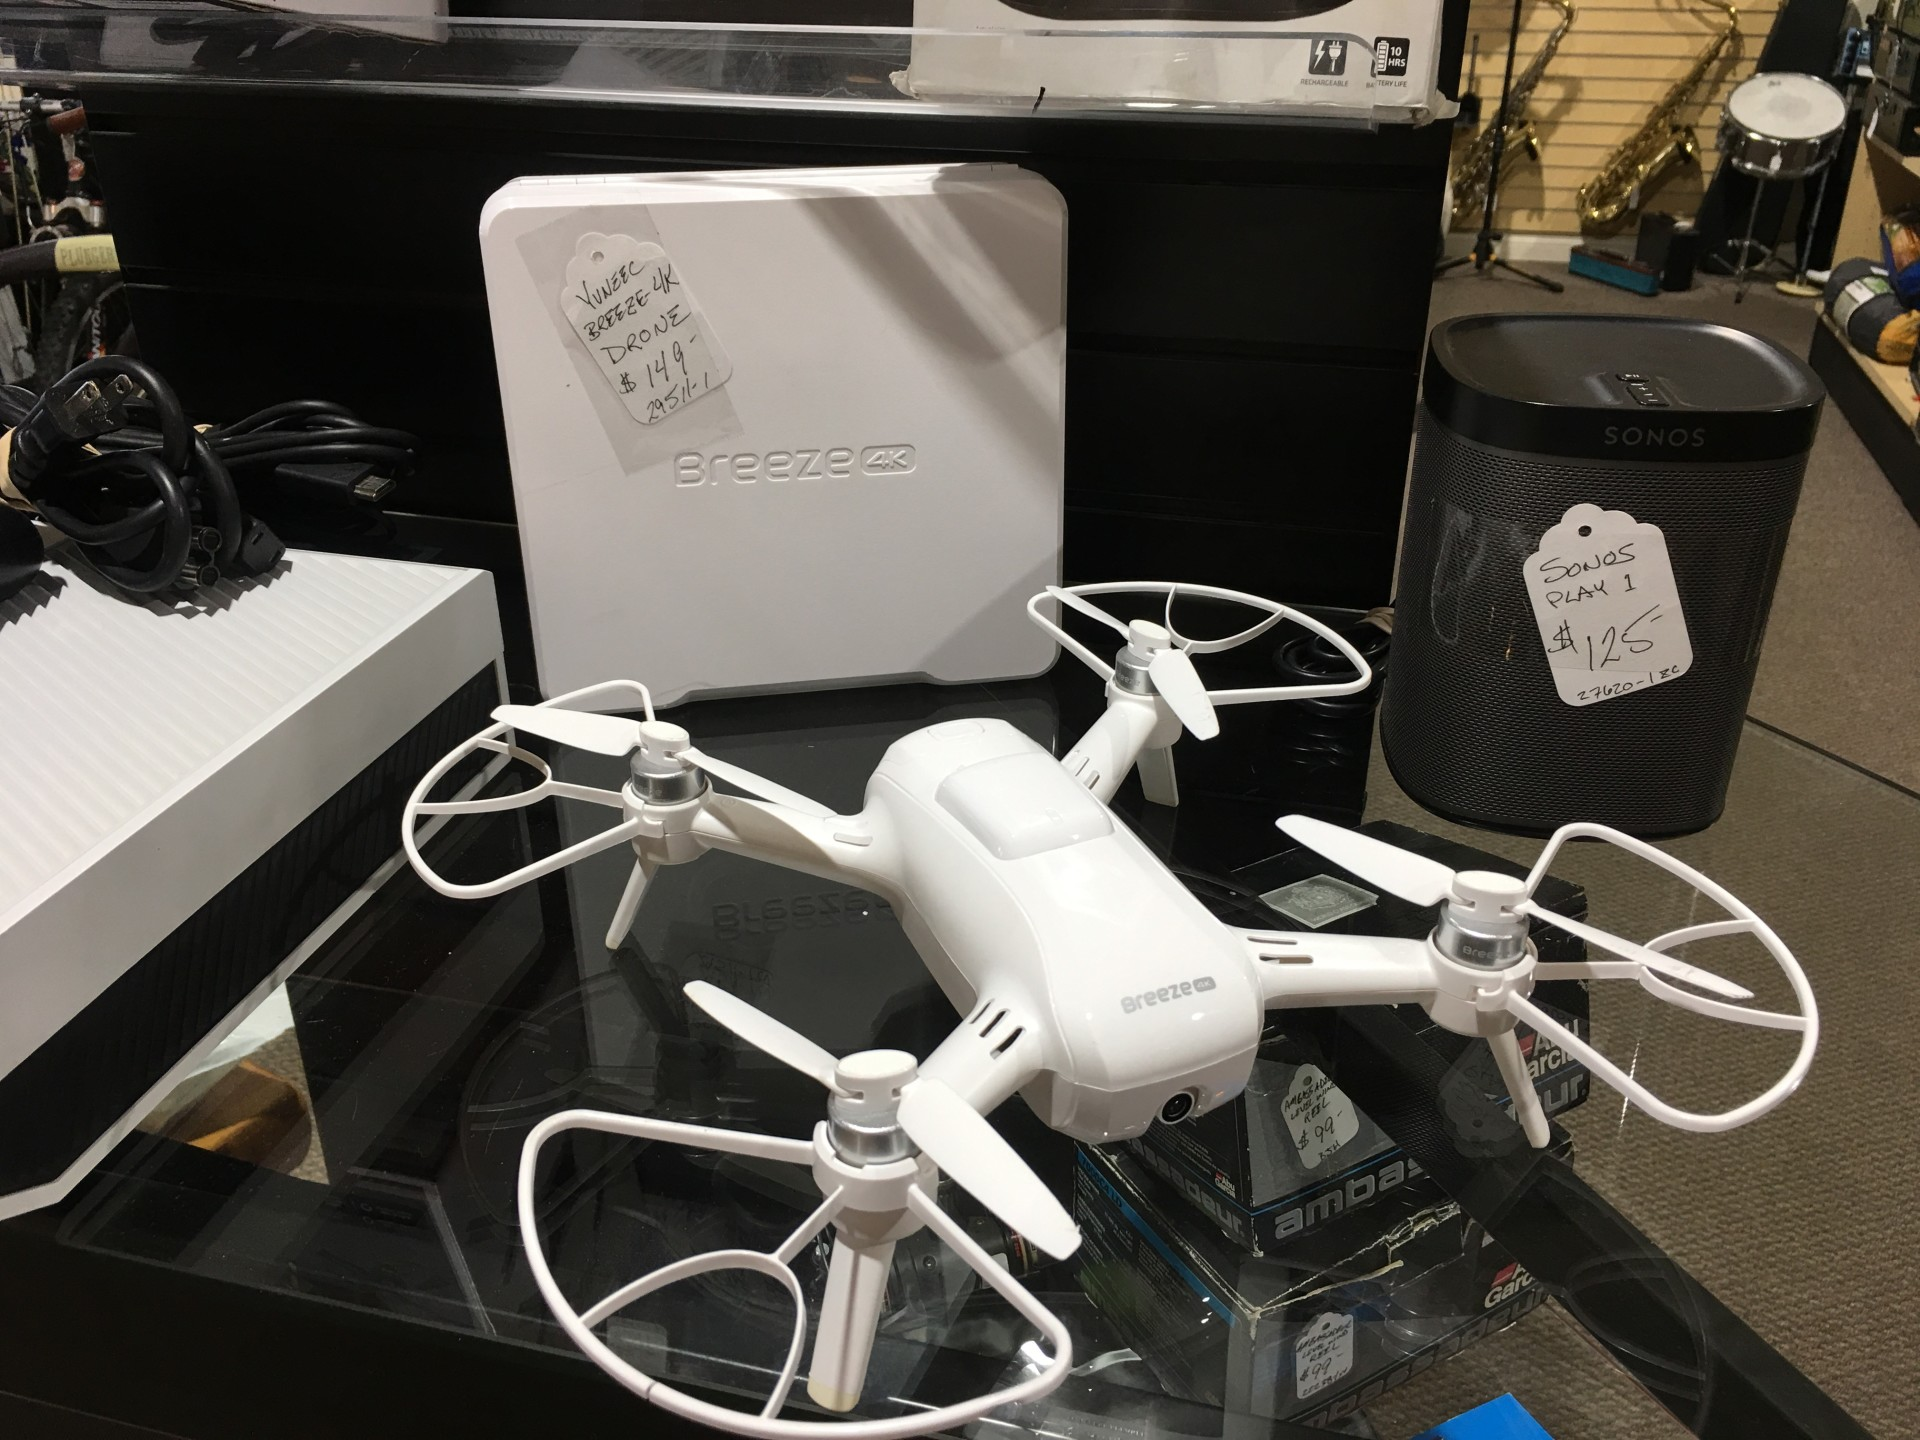 Yuneec Breeze - 4k Drone